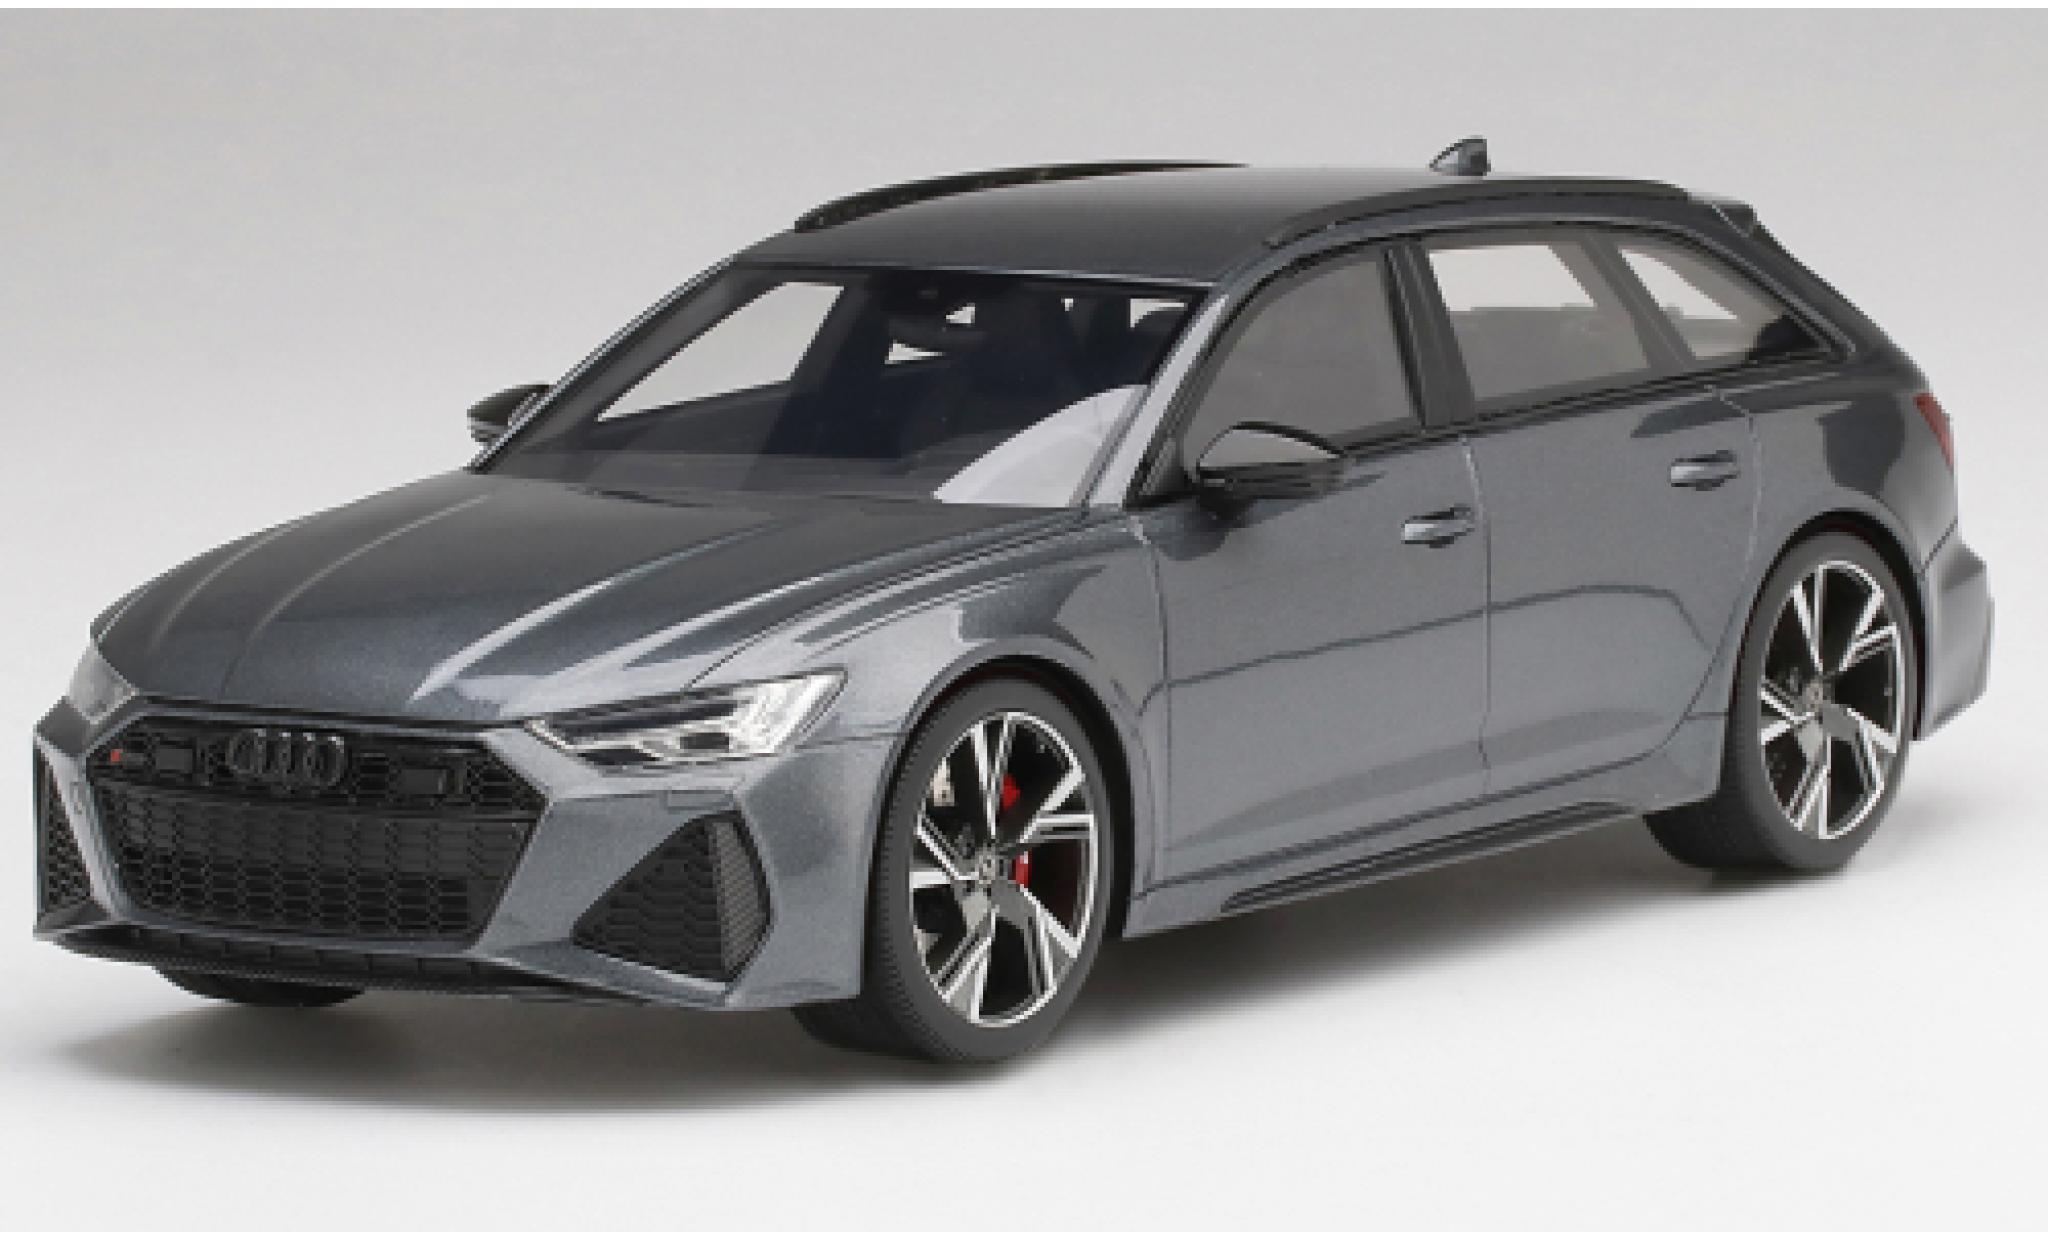 Audi RS6 1/18 Top Speed Avant Carbon Black Edition grey/black